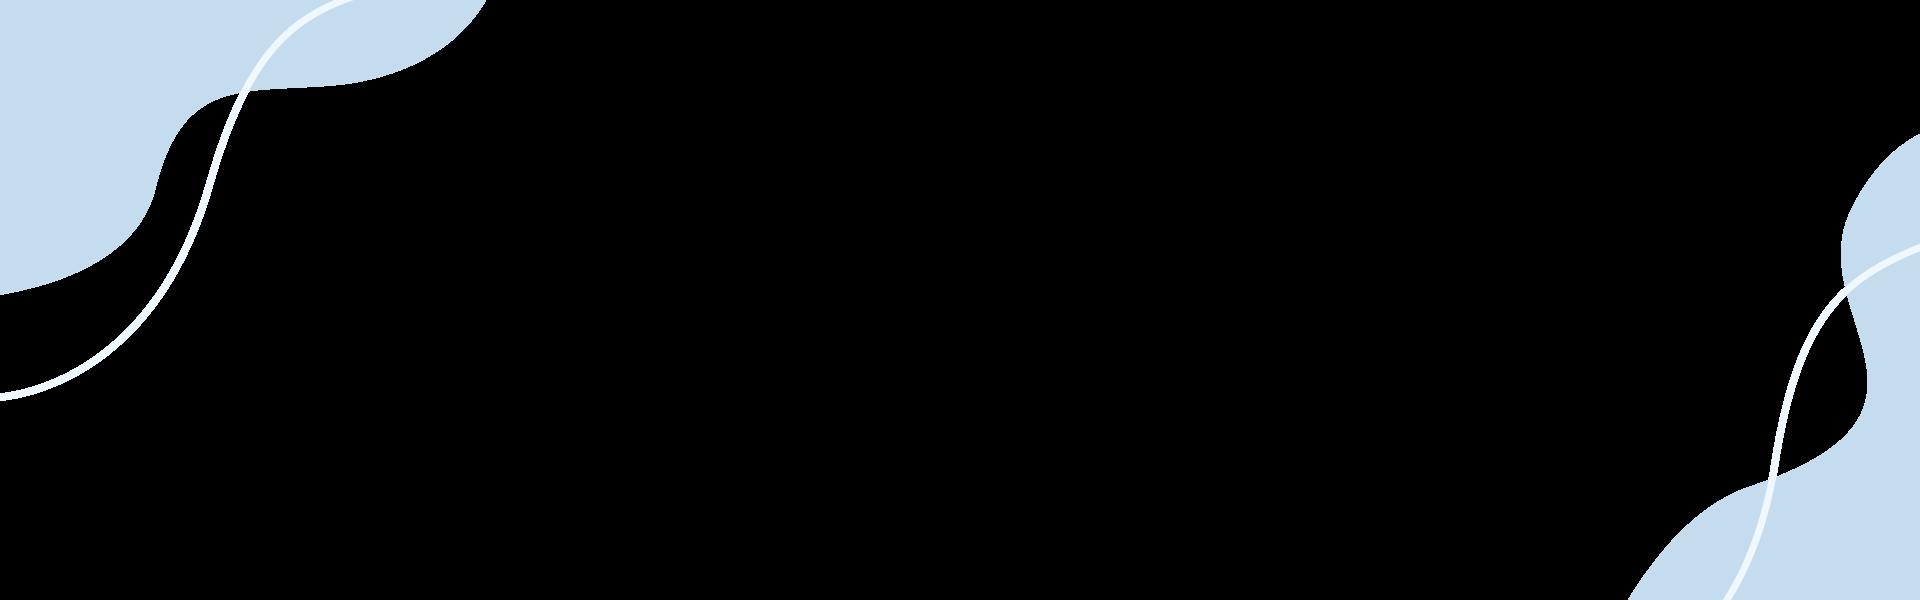 bg_02